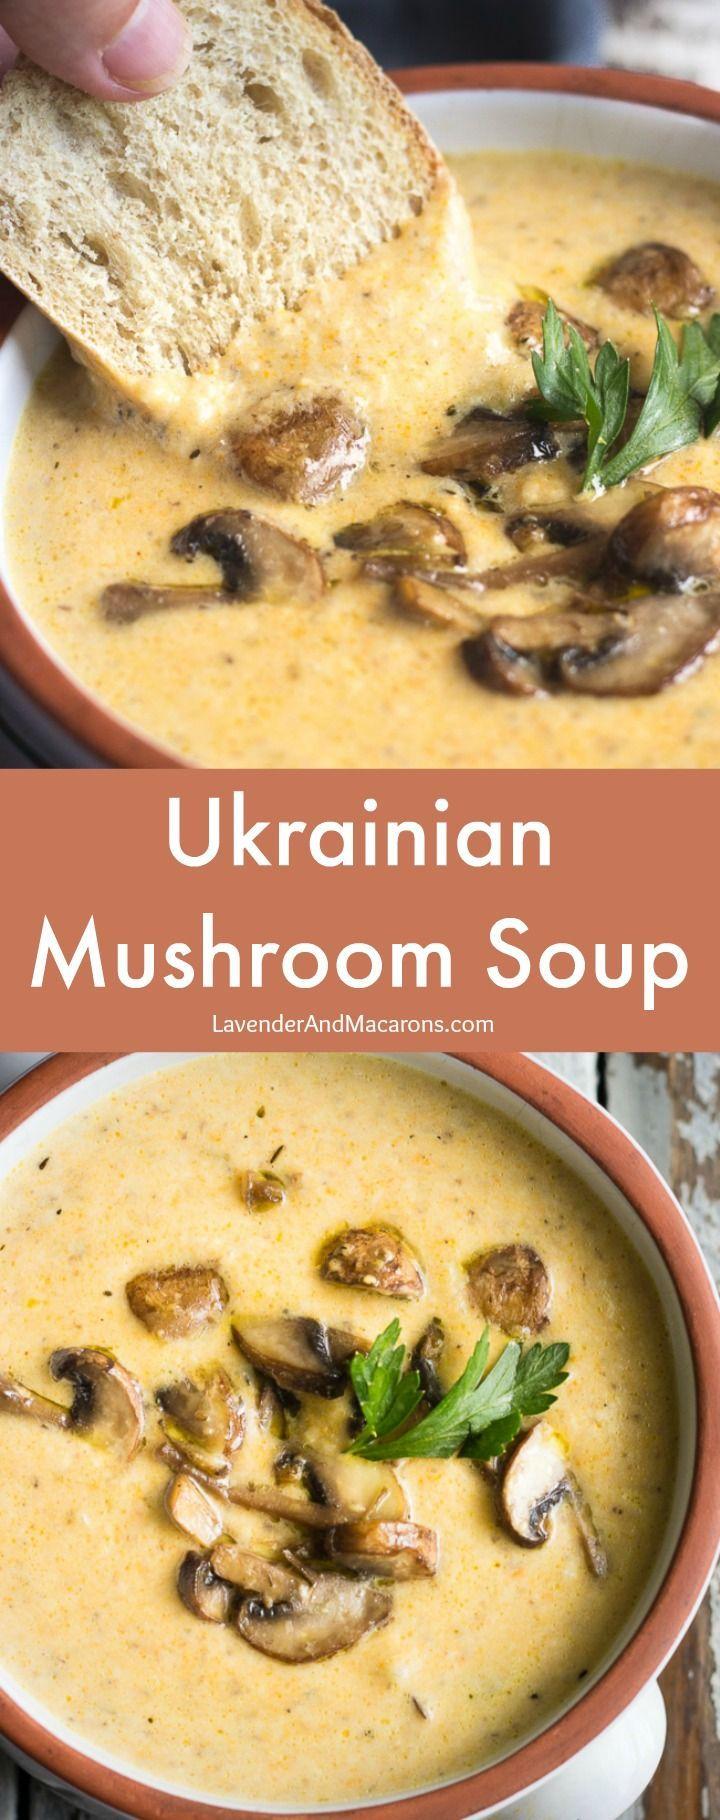 Ukrainian Mushroom Soup